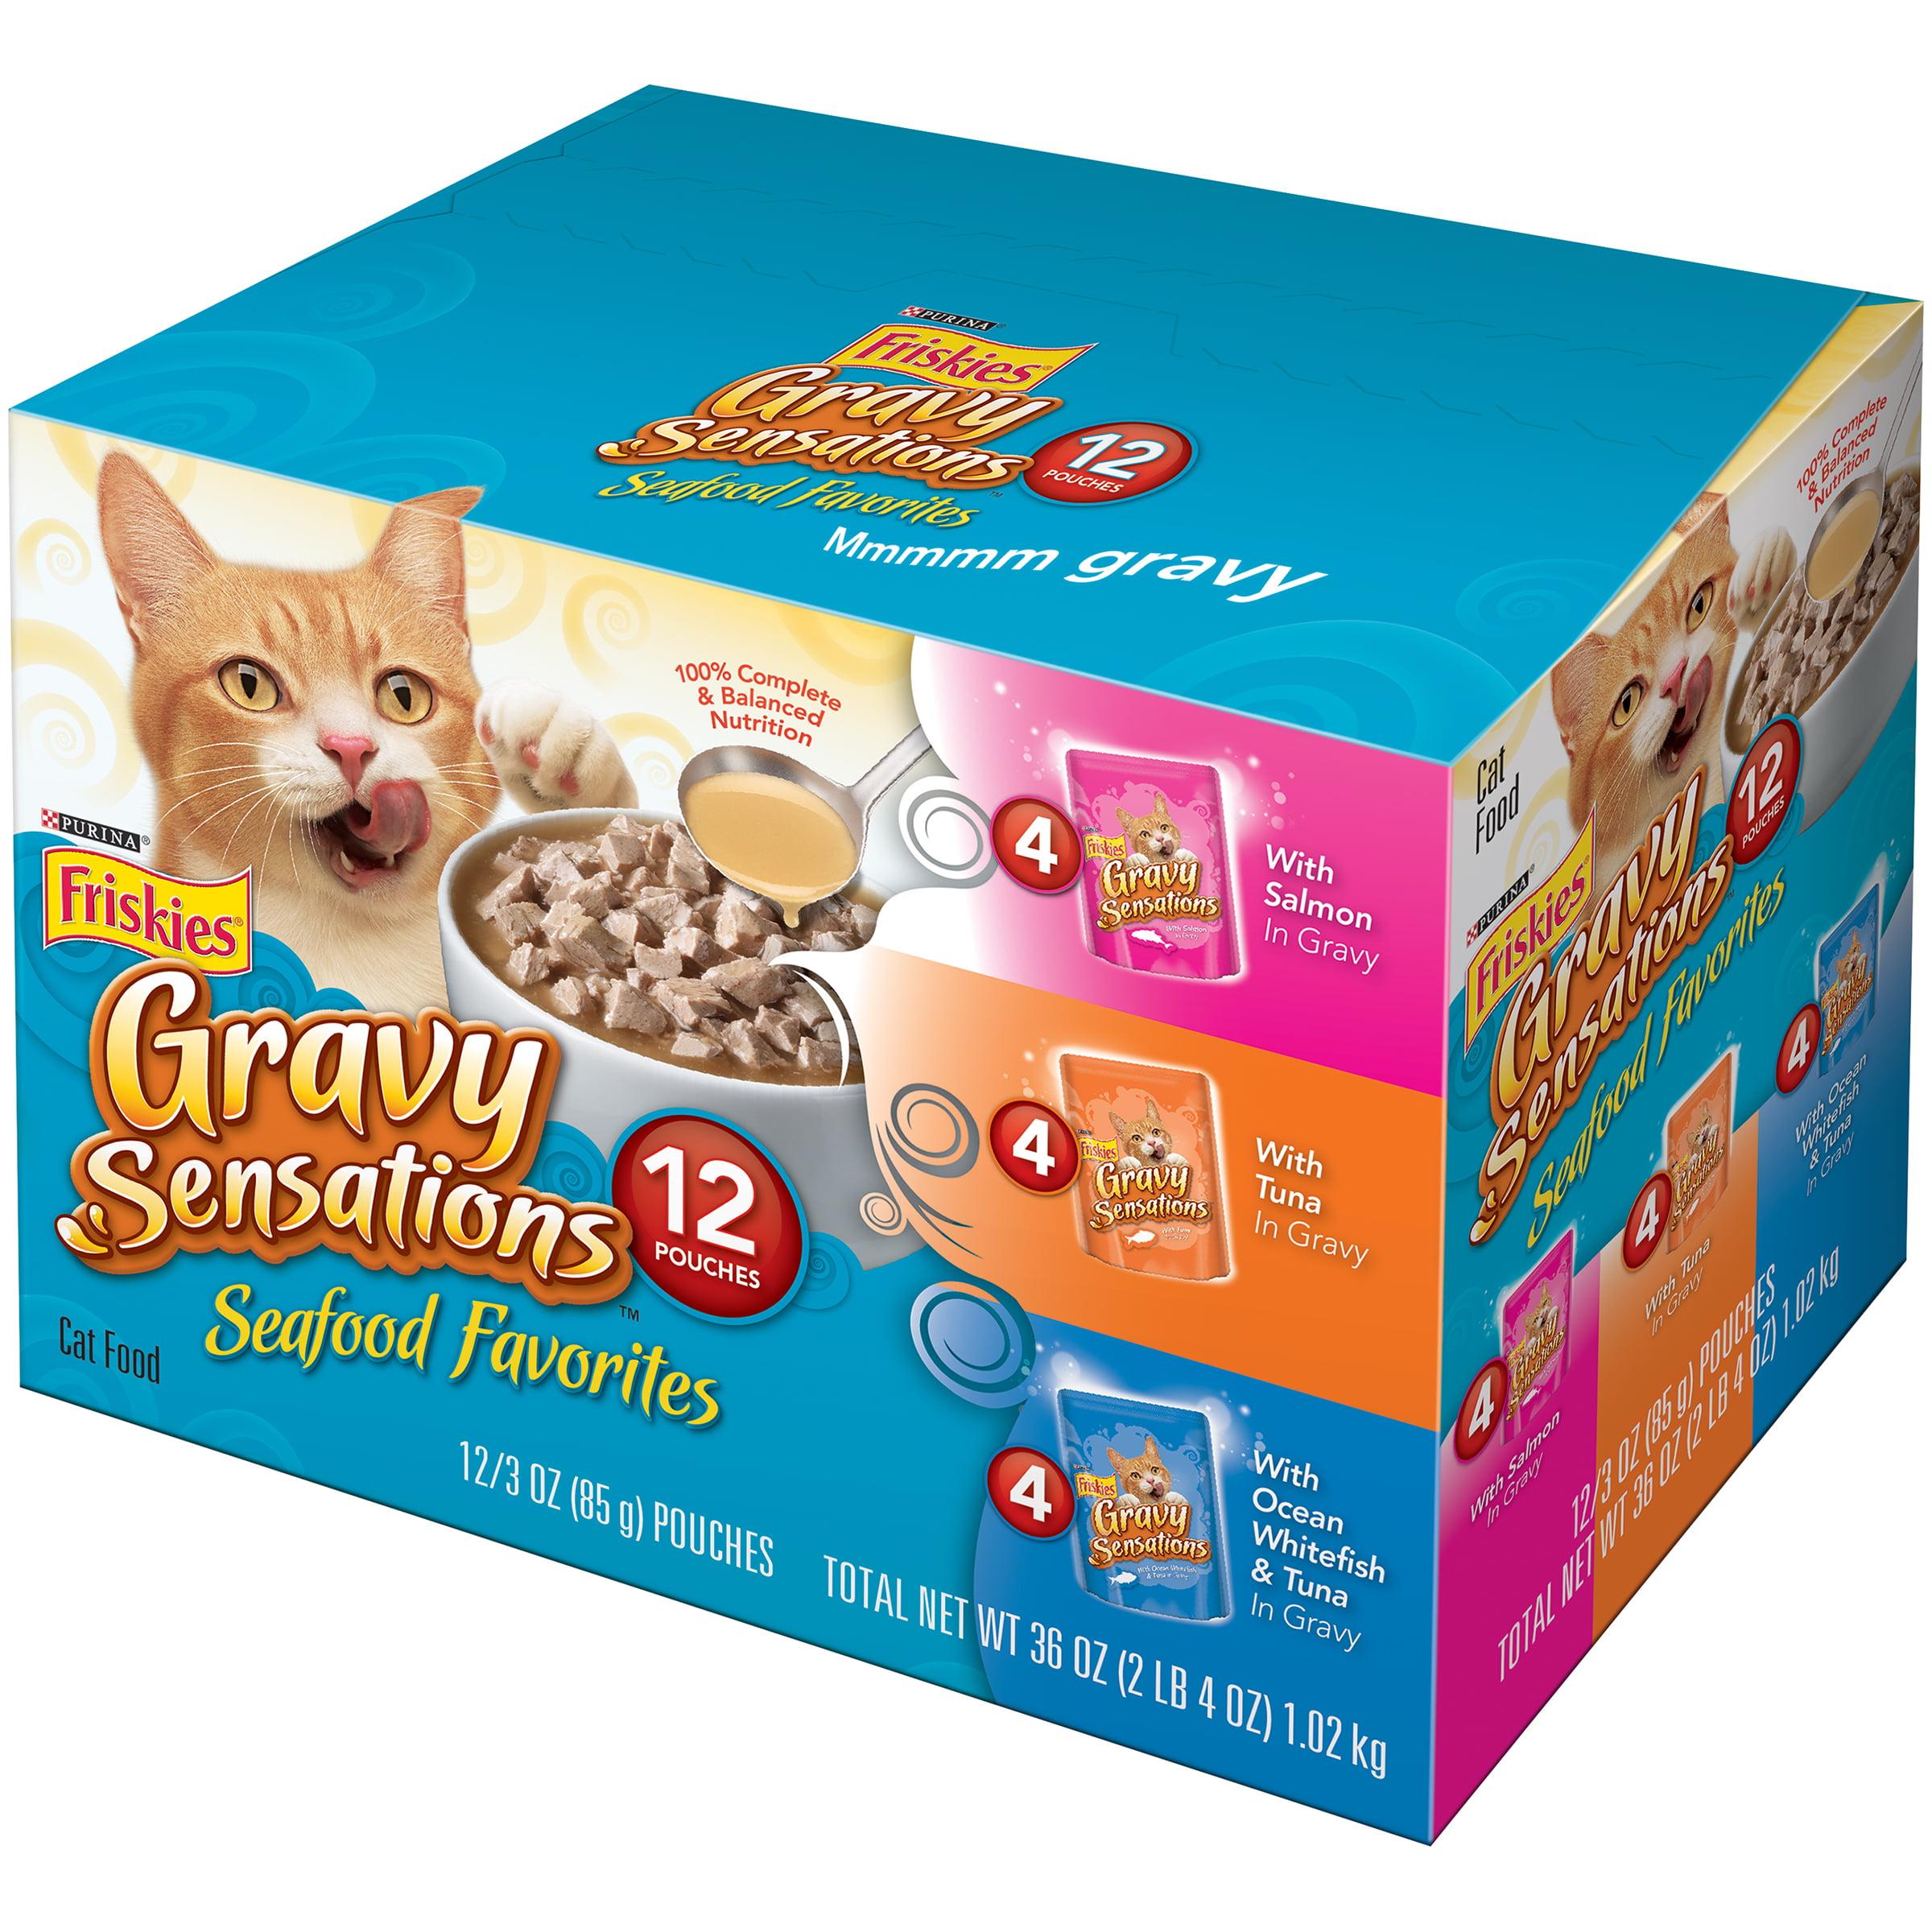 Purina Friskies Gravy Sensations Seafood Favorites Cat Food Variety Pack 12-3 oz. Pouches